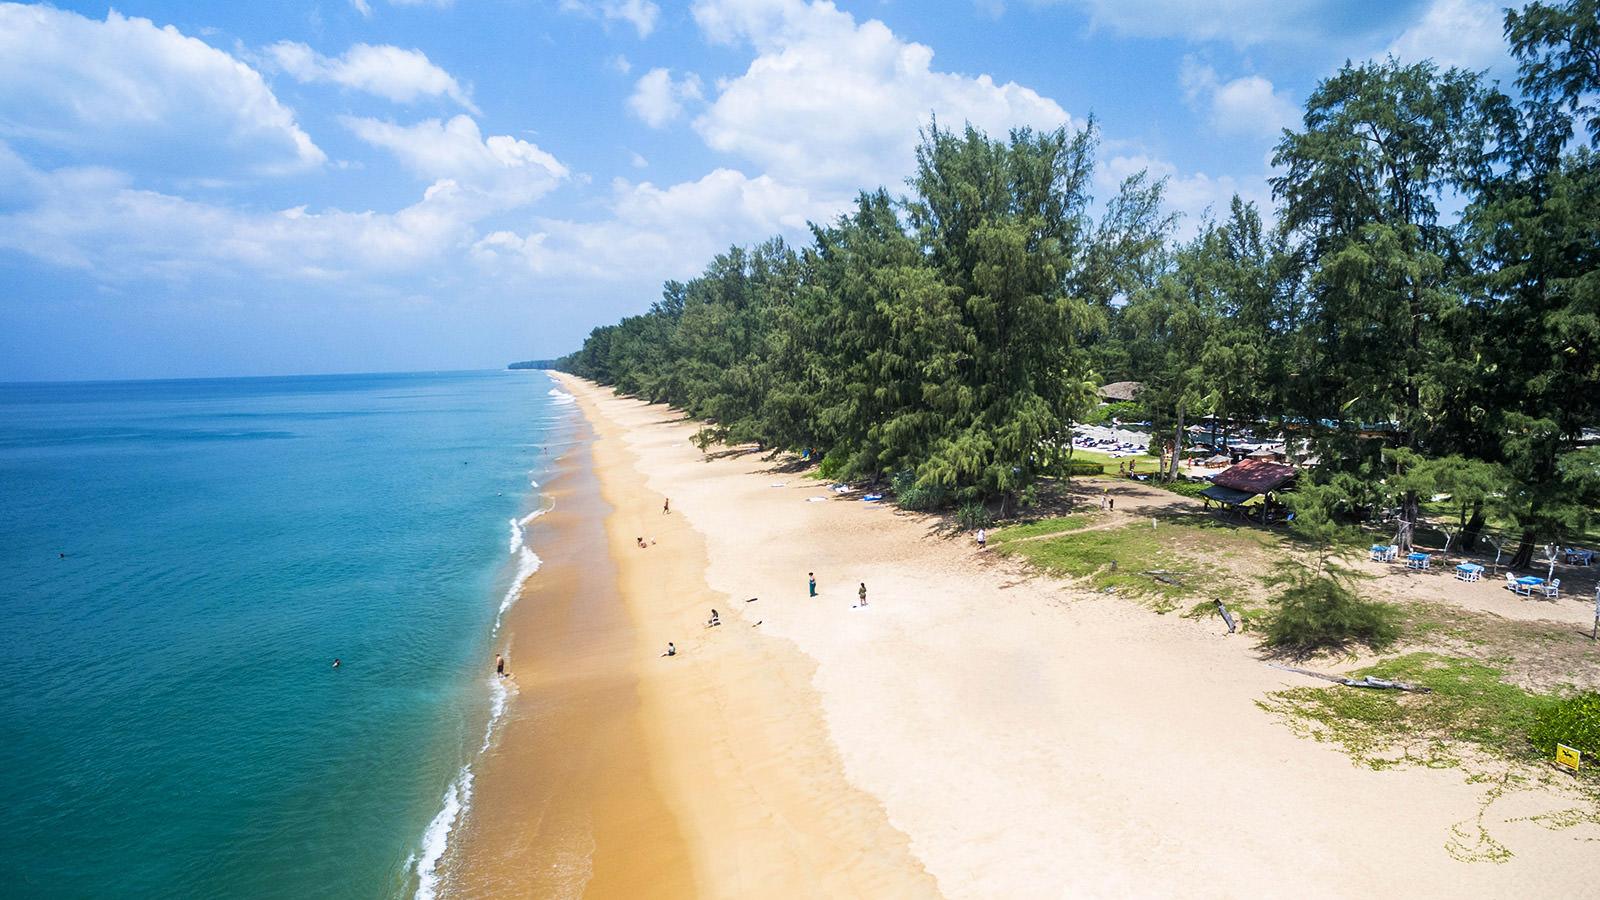 Пляж Май Кхао, самый большой пляж Тайланда